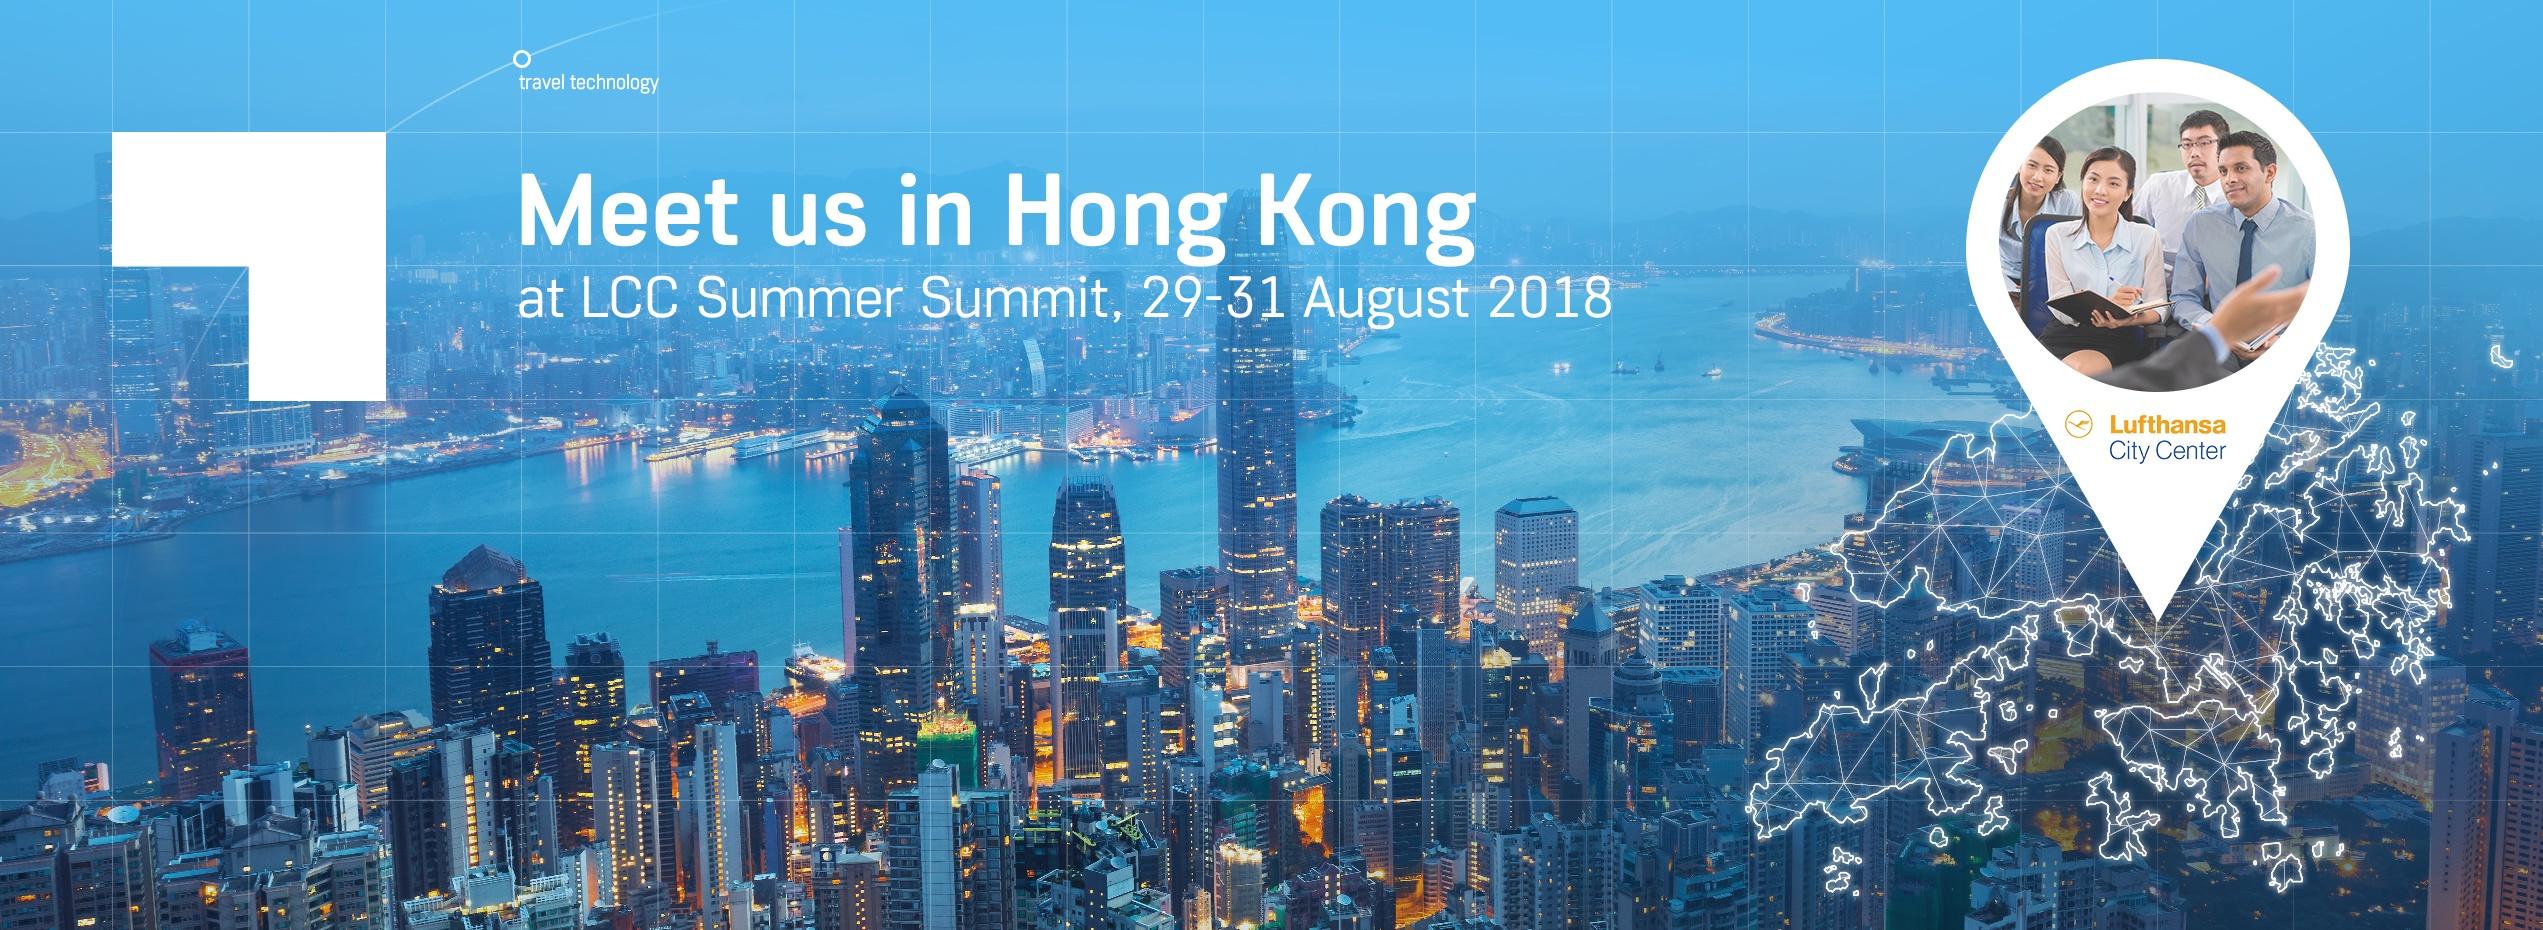 LCC Summer Summit 2018